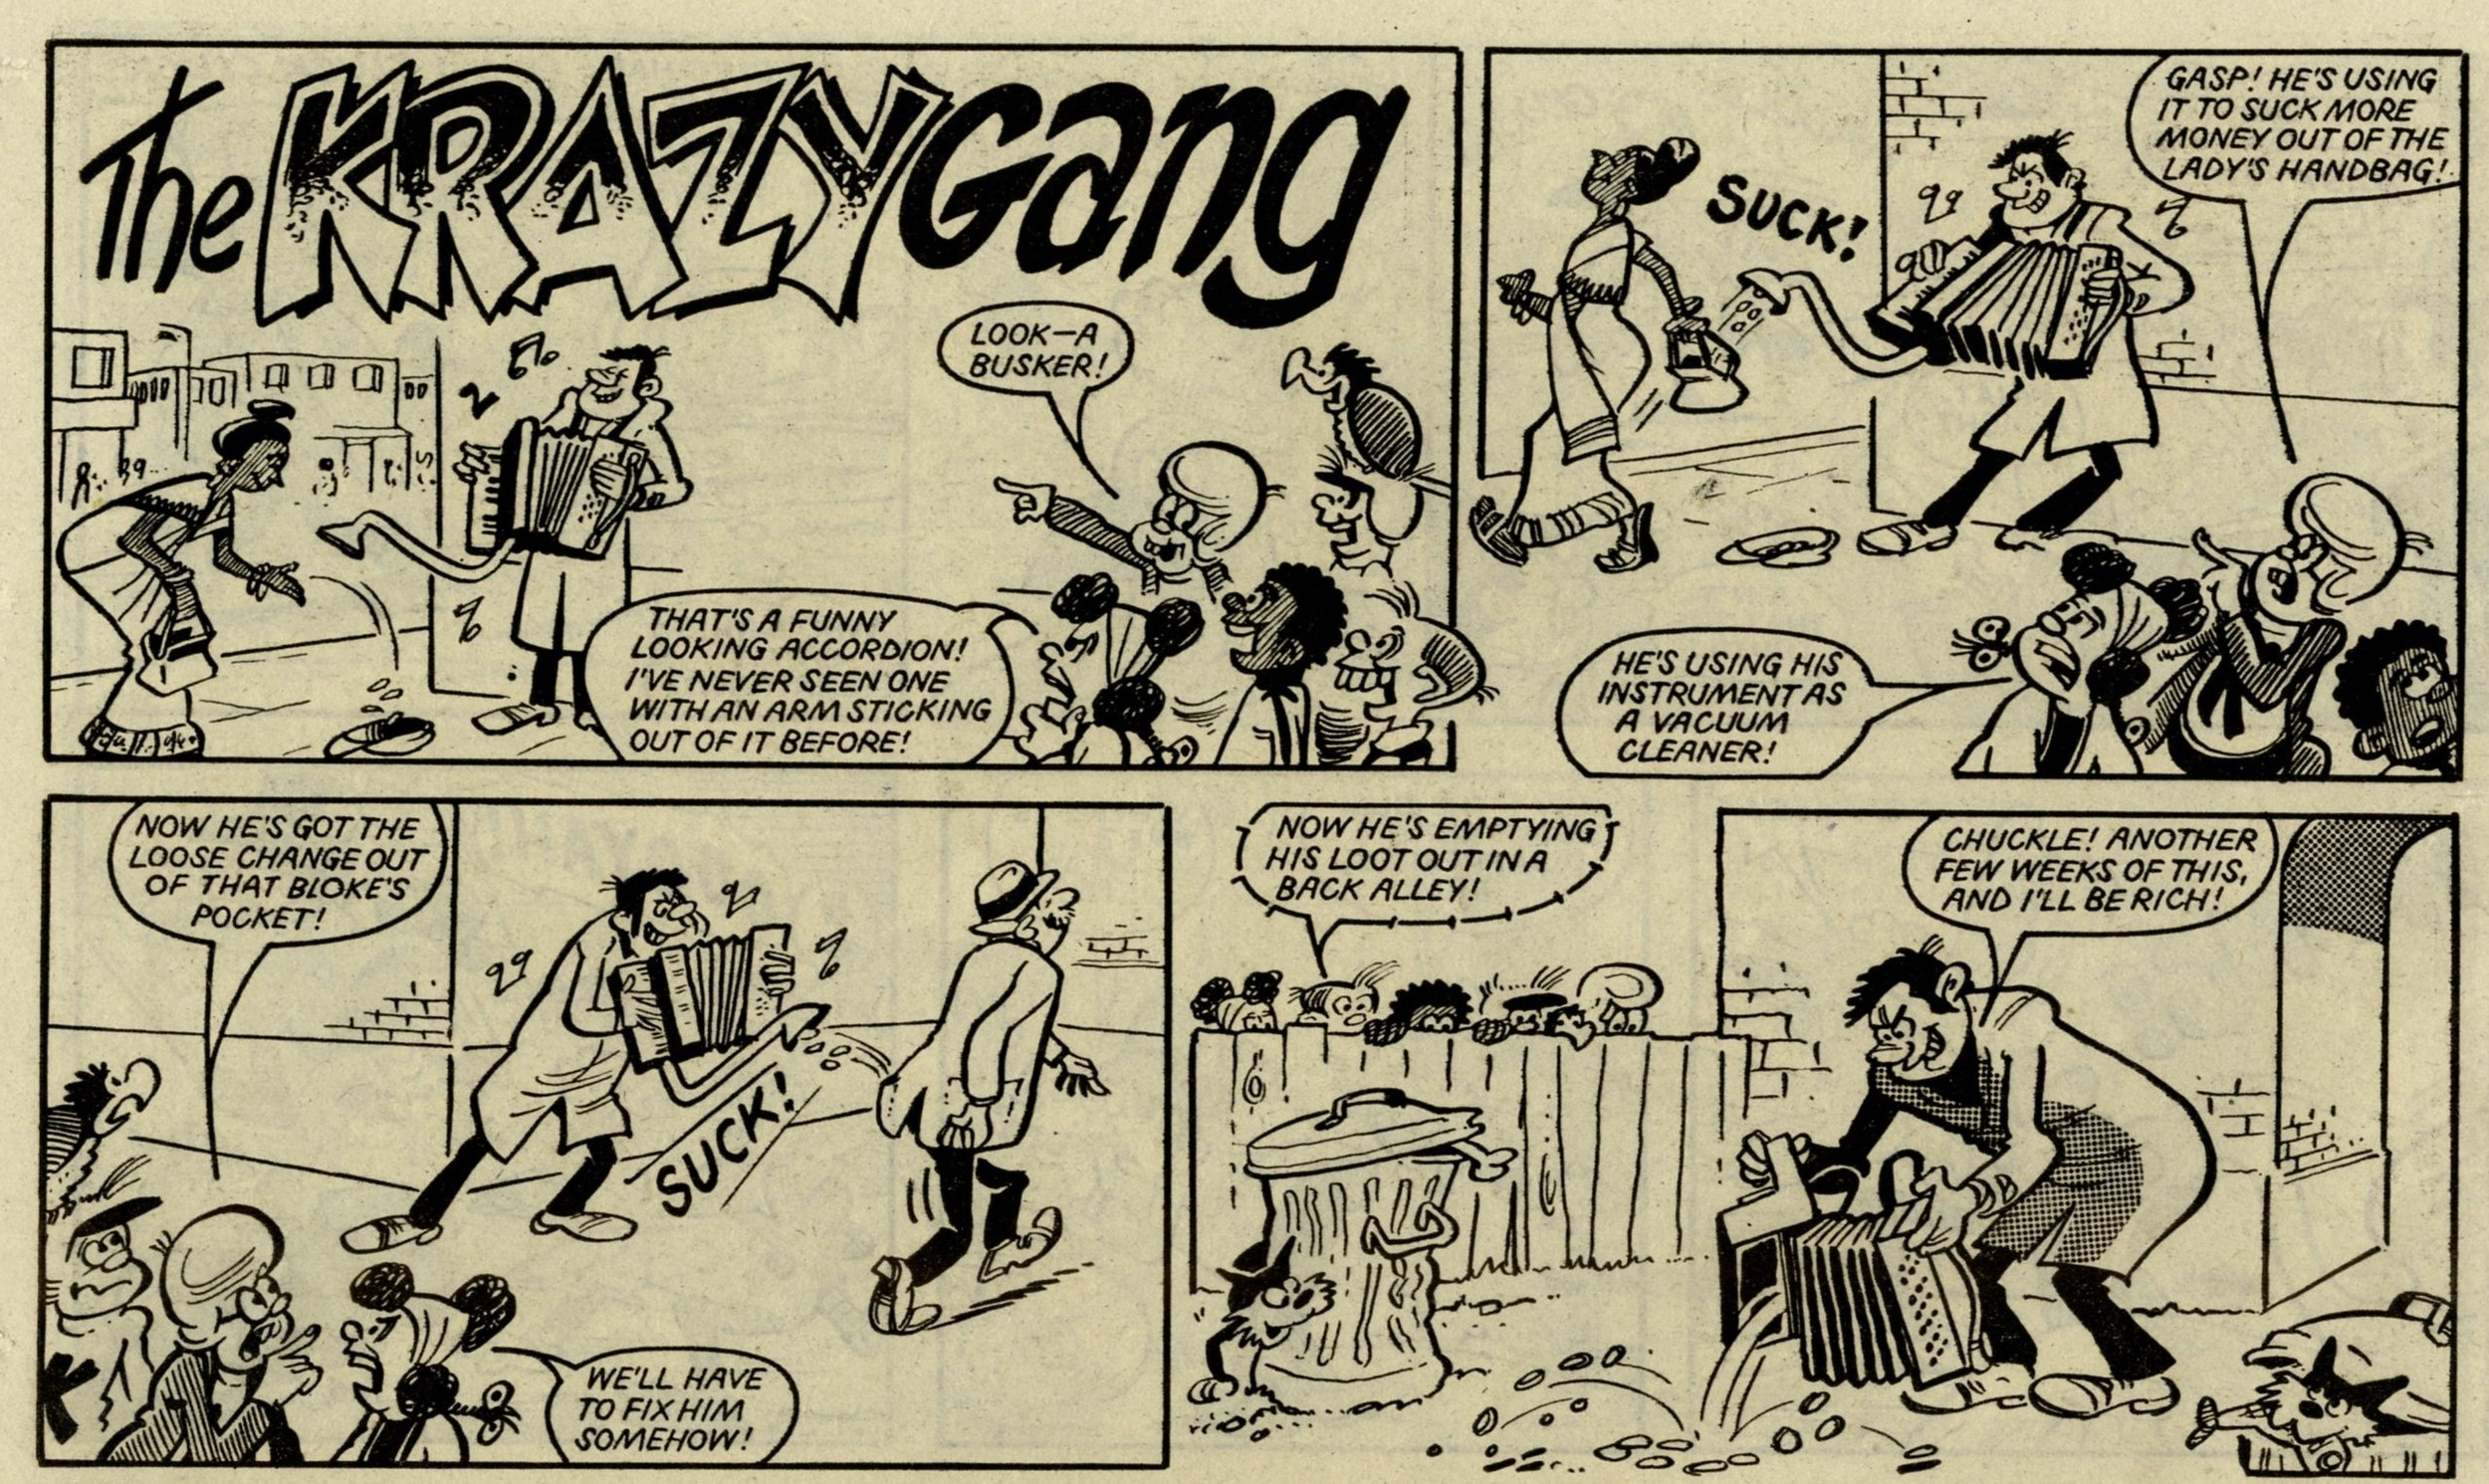 The Krazy Gang: Ian Knox or Bob Hill? (artist)